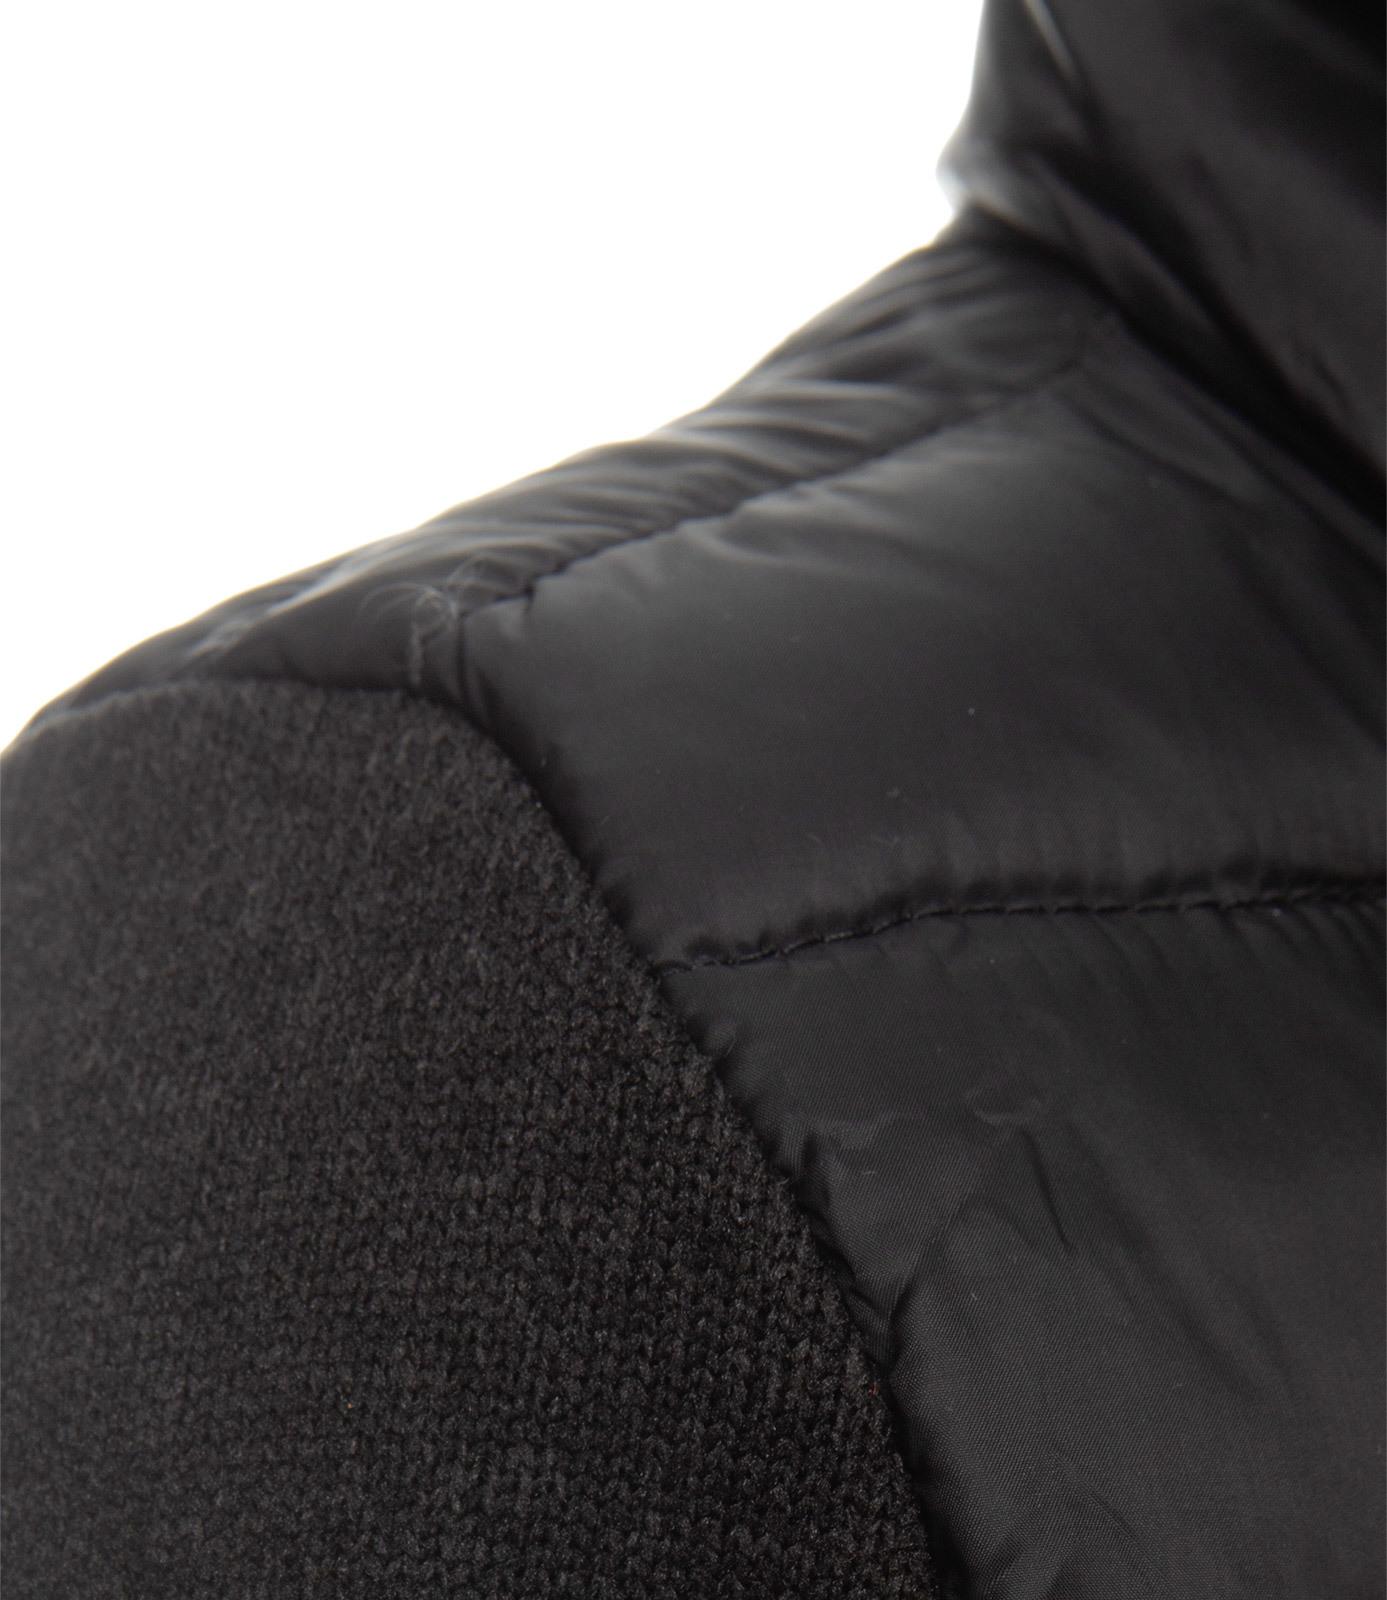 Jacke im Materialmix mit Artworks